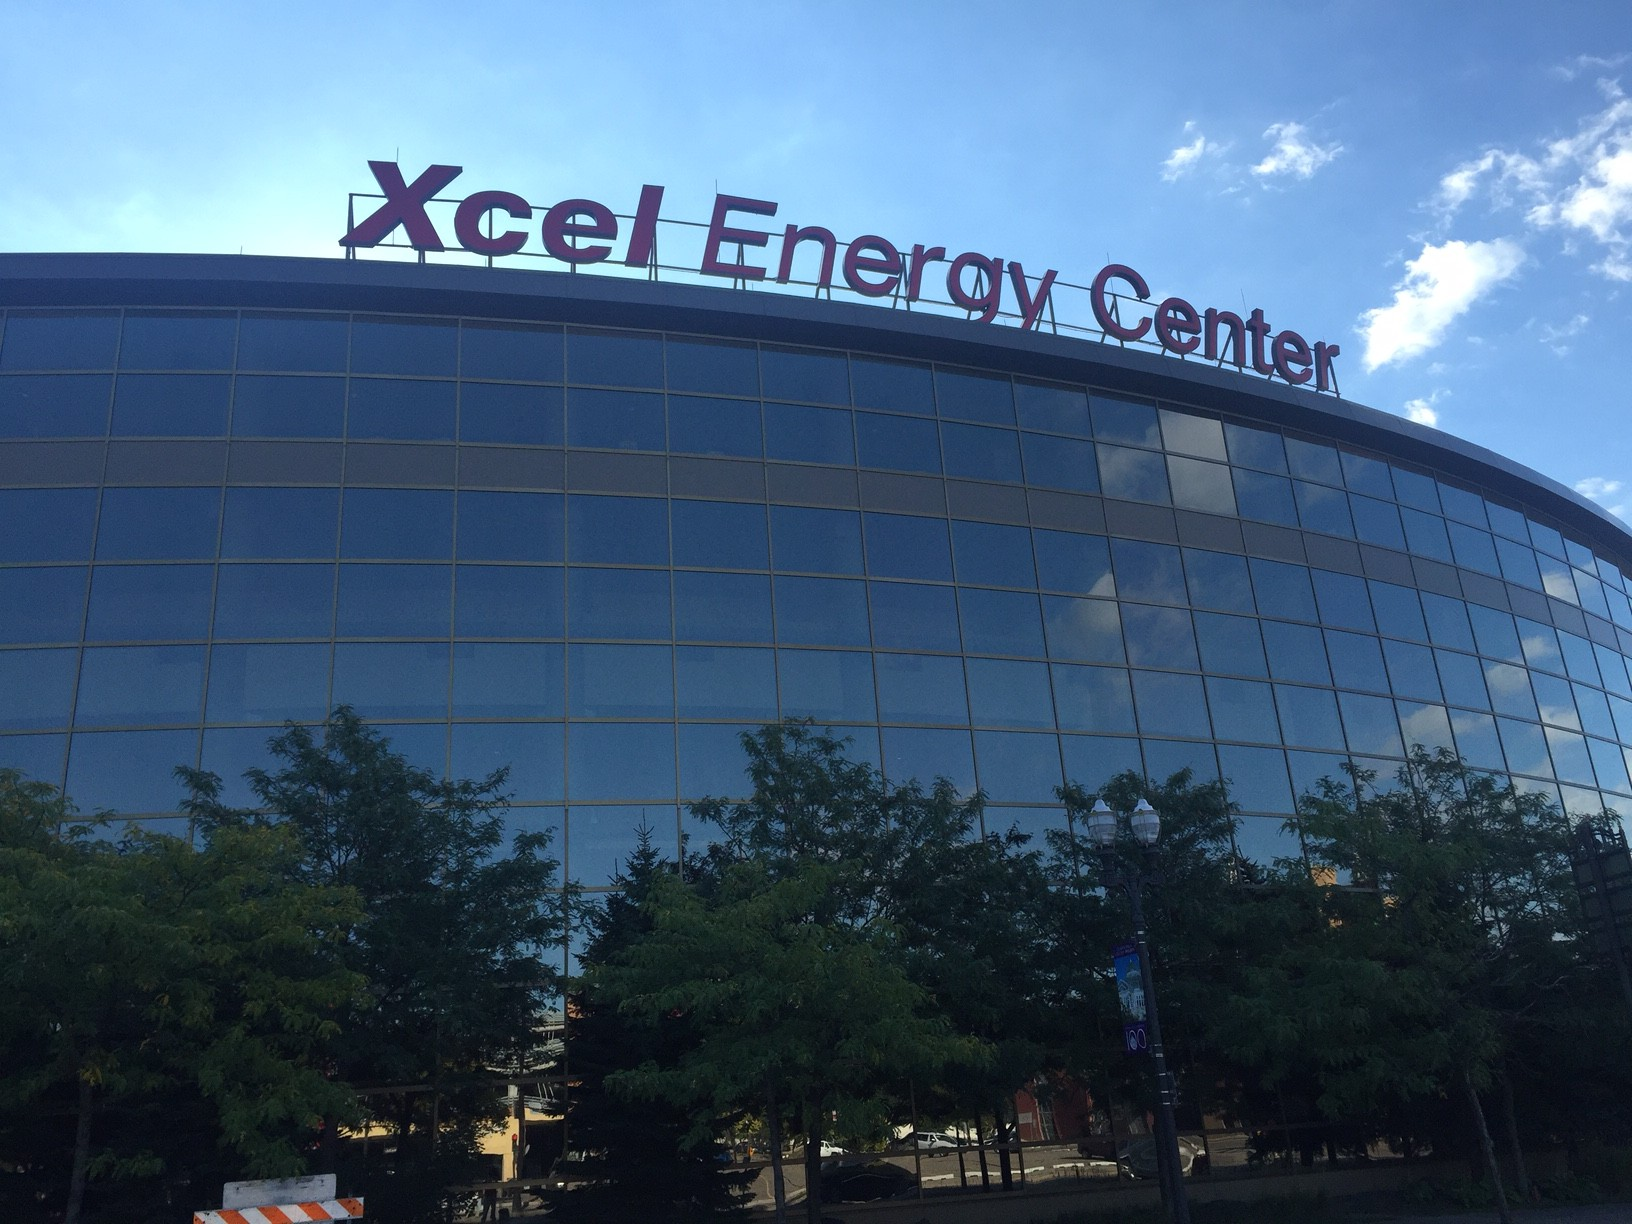 The XCel Energy Center in St. Paul, Minn., is the site of Jack Eichel's preseason debut tonight (Mike Harrington/Buffalo News).